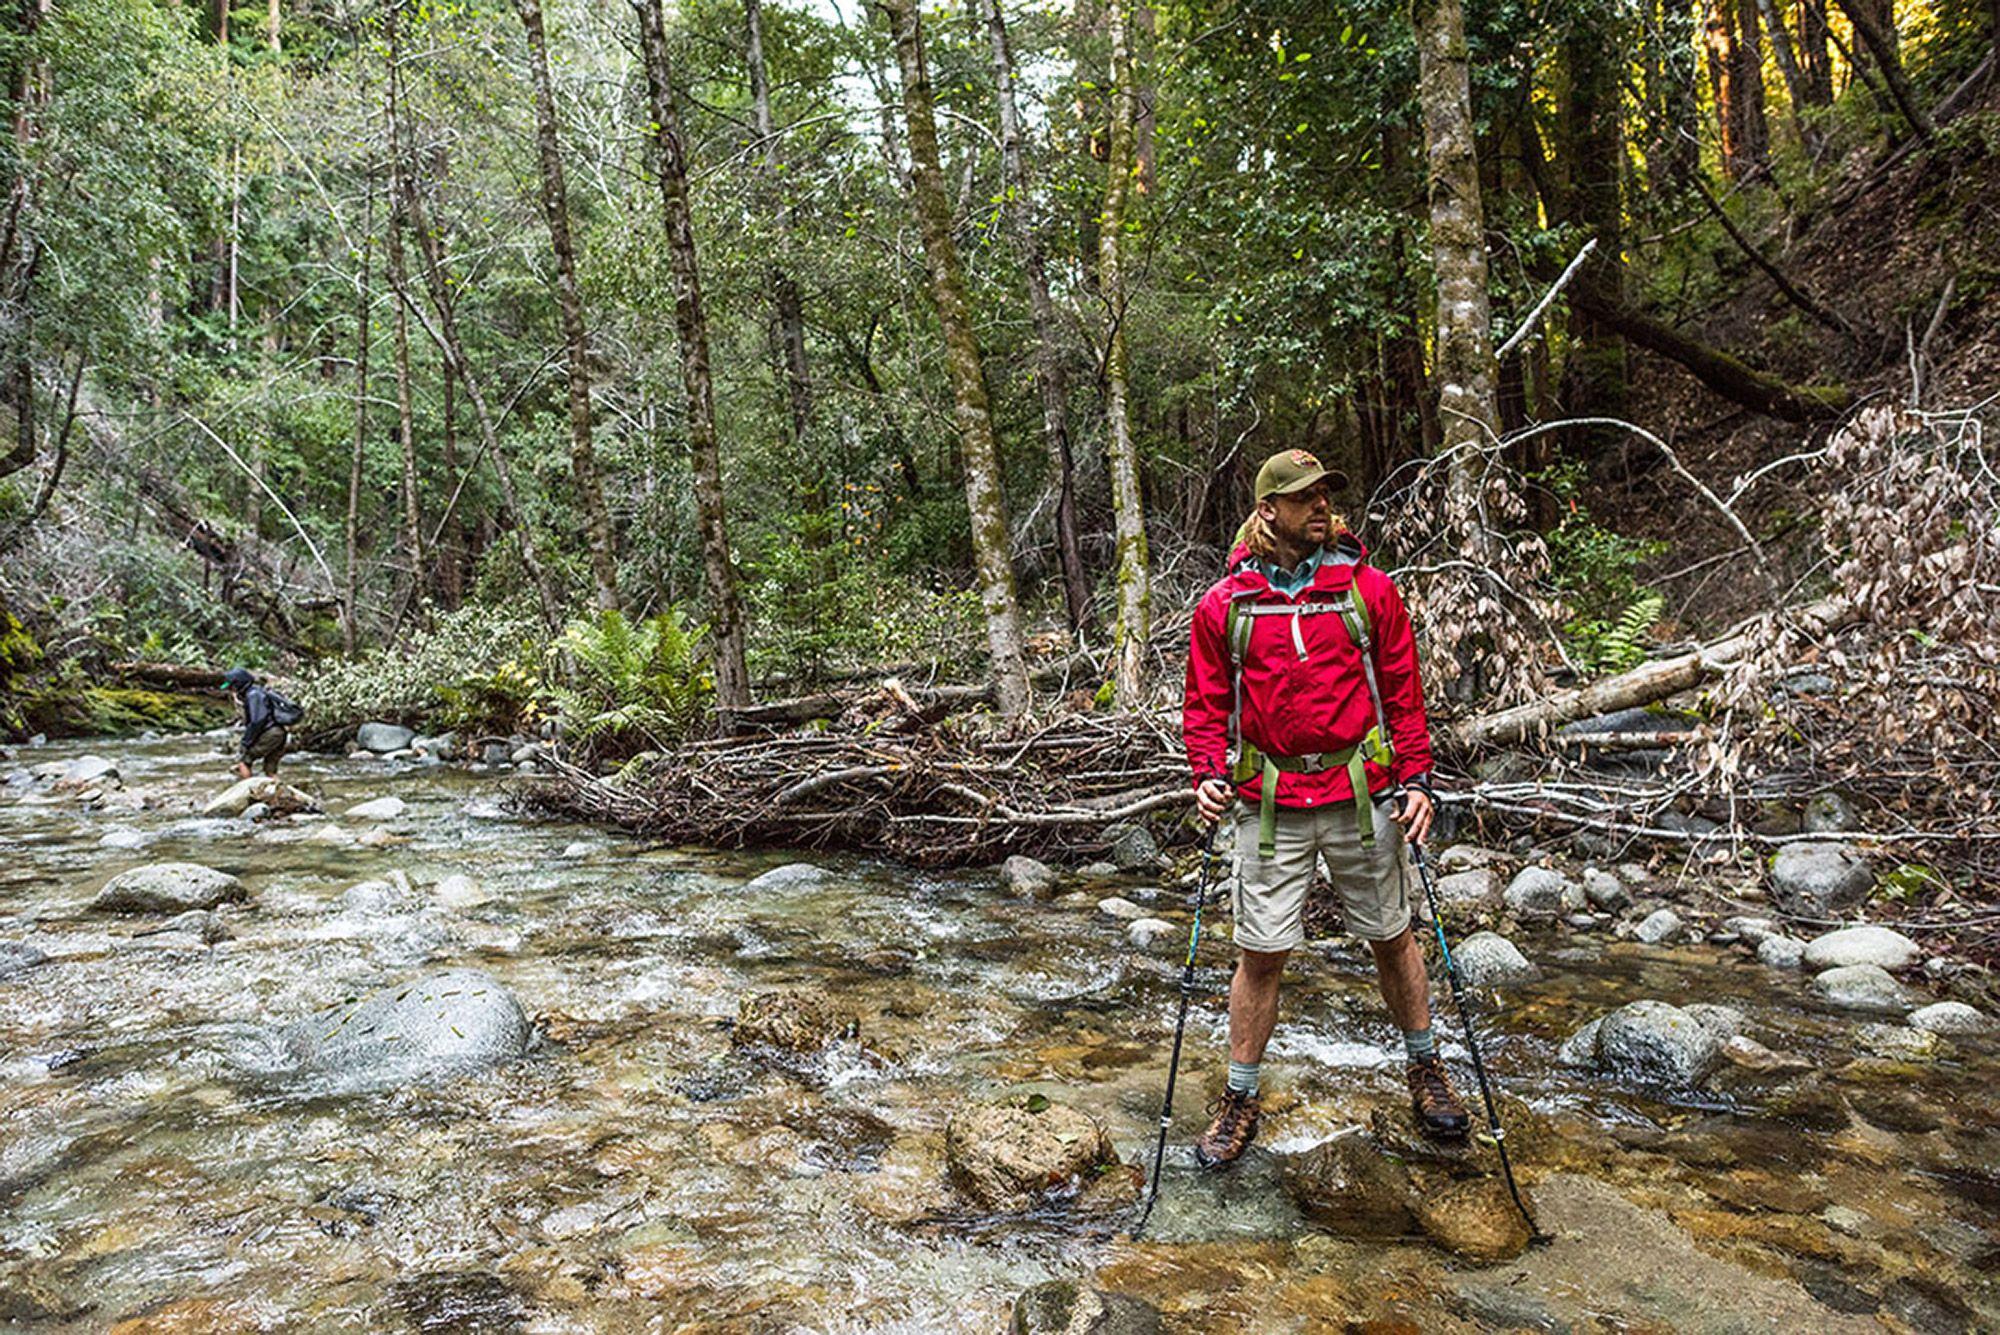 4 steps to safe stream crossings goeast streaming